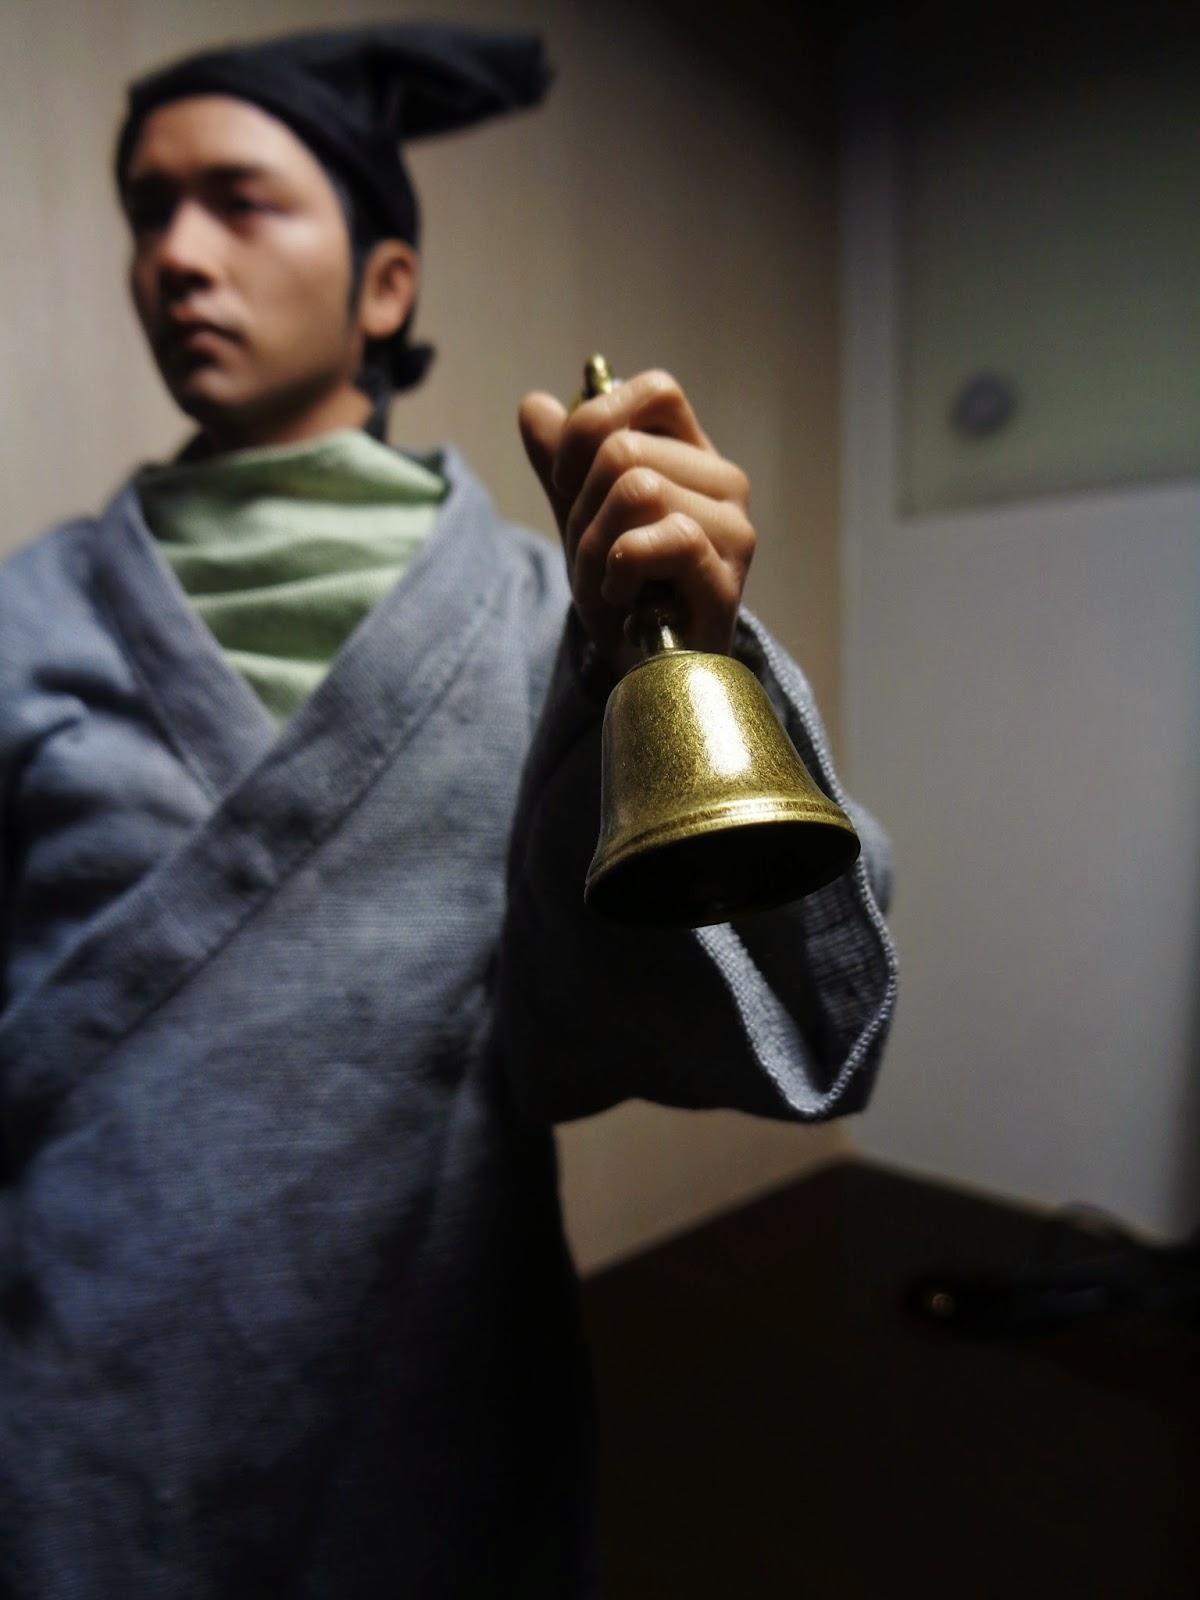 半支煙 pt 二: Enterbay - A Chinese Ghost Story (倩女幽魂) : Ning Choi San (寧采臣).